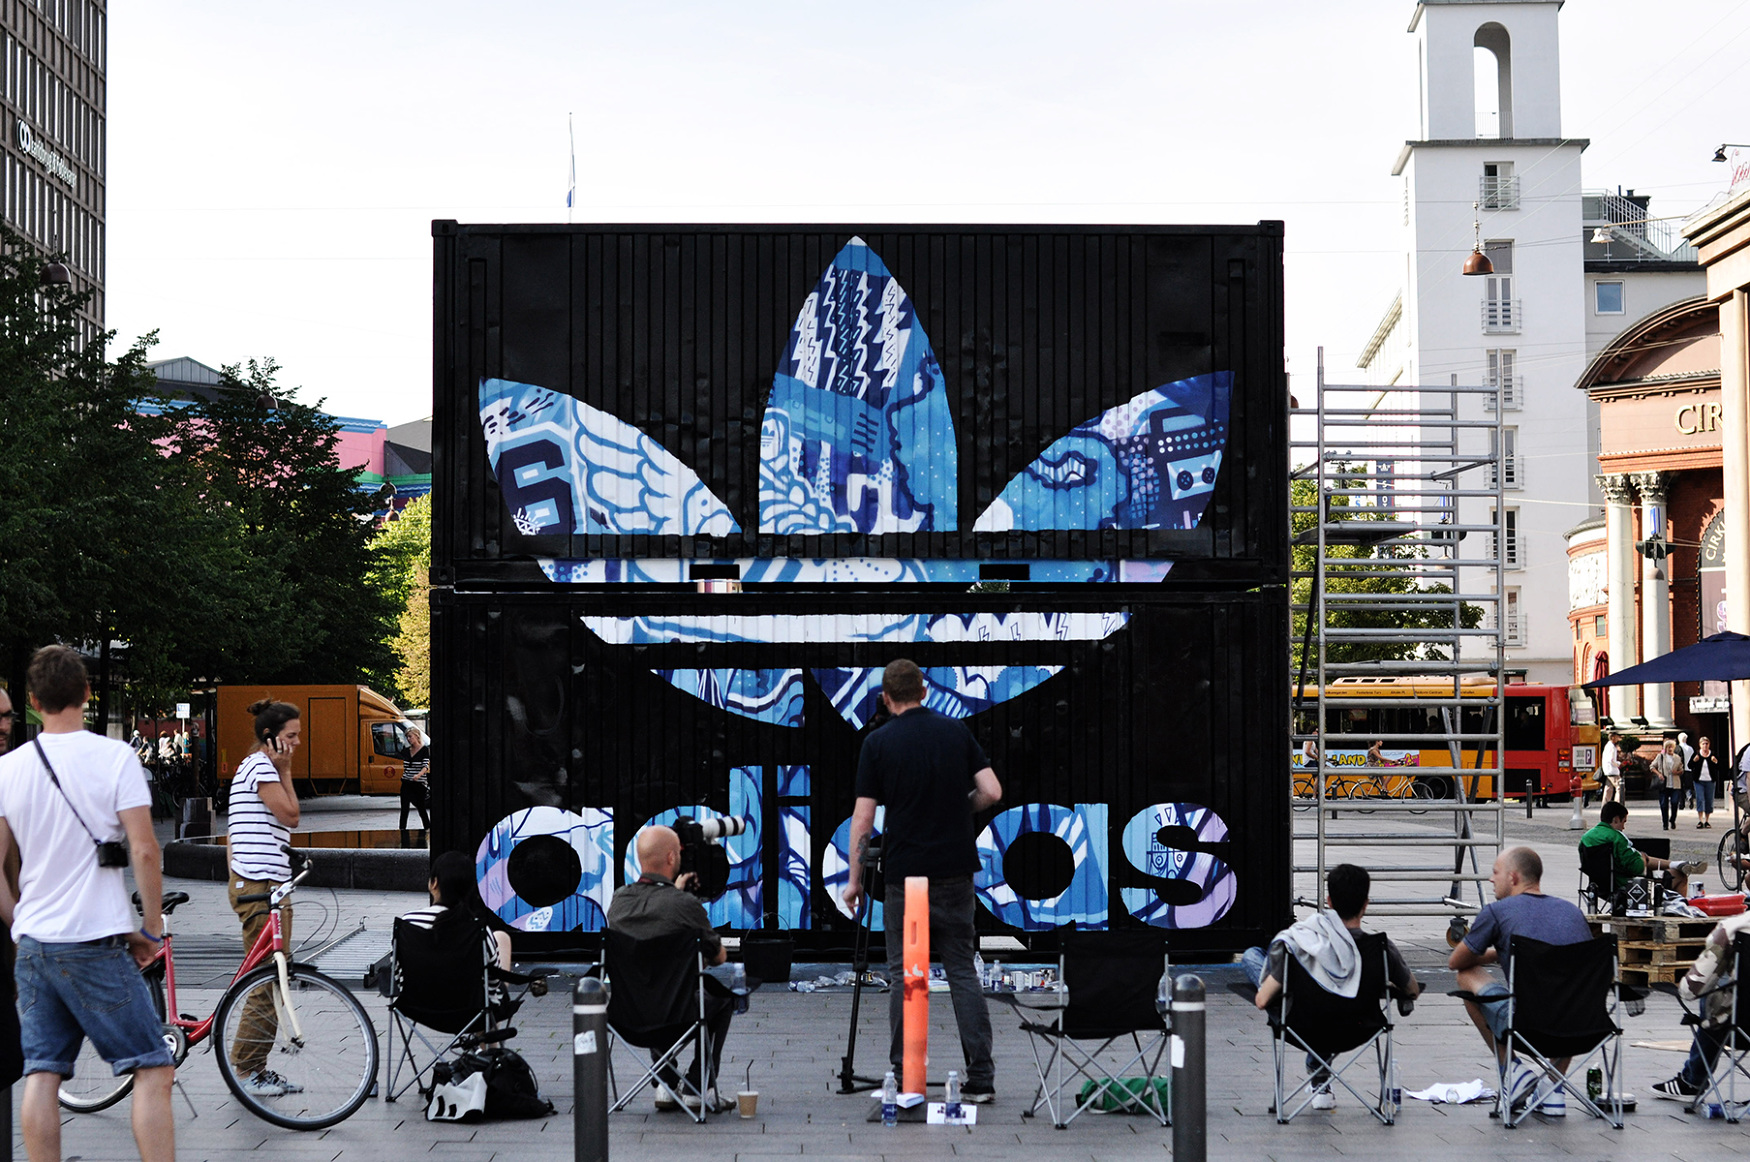 adidas mural, Copenhagen Fashion Week